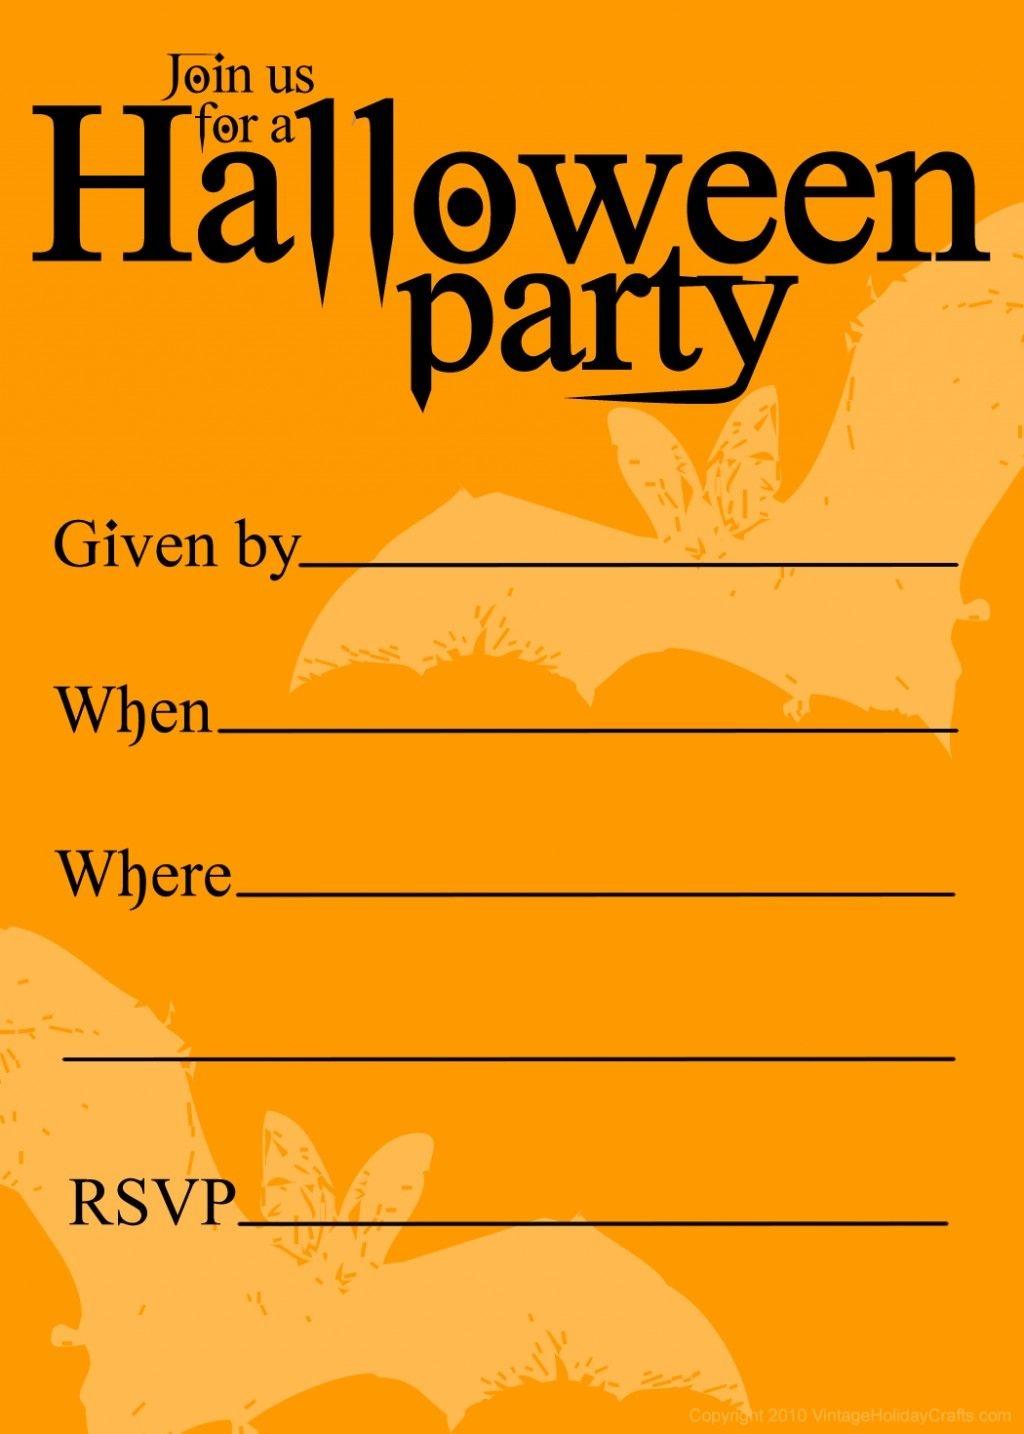 Free Printable Halloween Birthday Invitations Templates   Halloween - Free Halloween Birthday Invitation Templates Printable